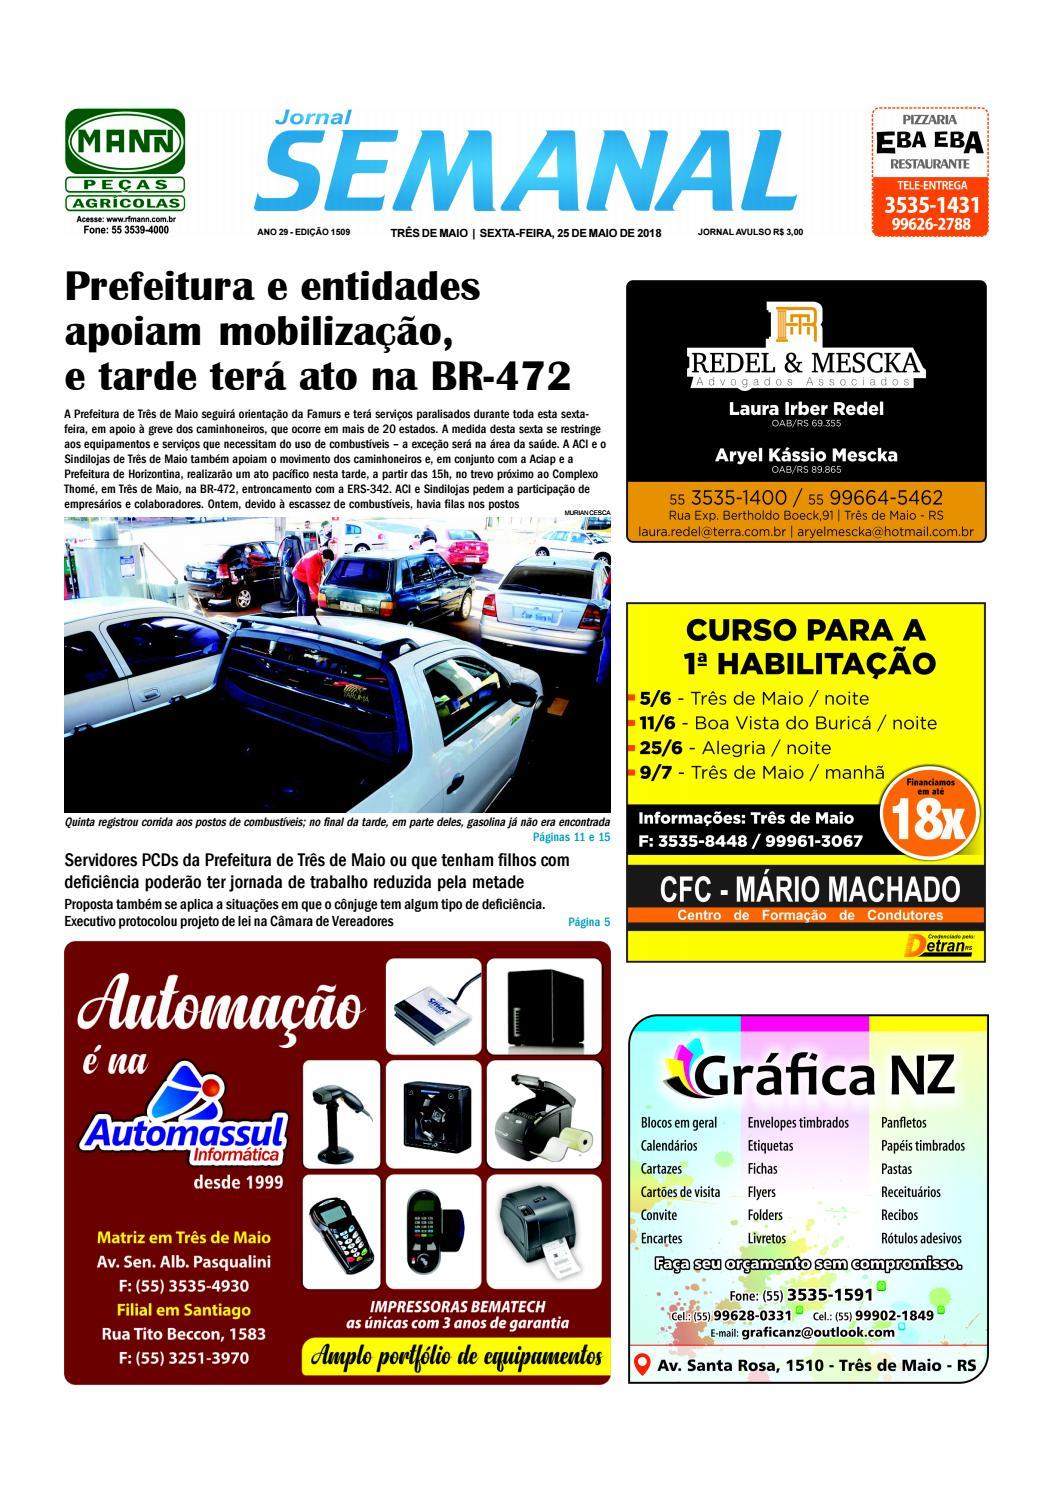 0bcb8cdebf4 Semanal 25 de maio de 2018 - Ed. 1509 by JORNAL Semanal - issuu